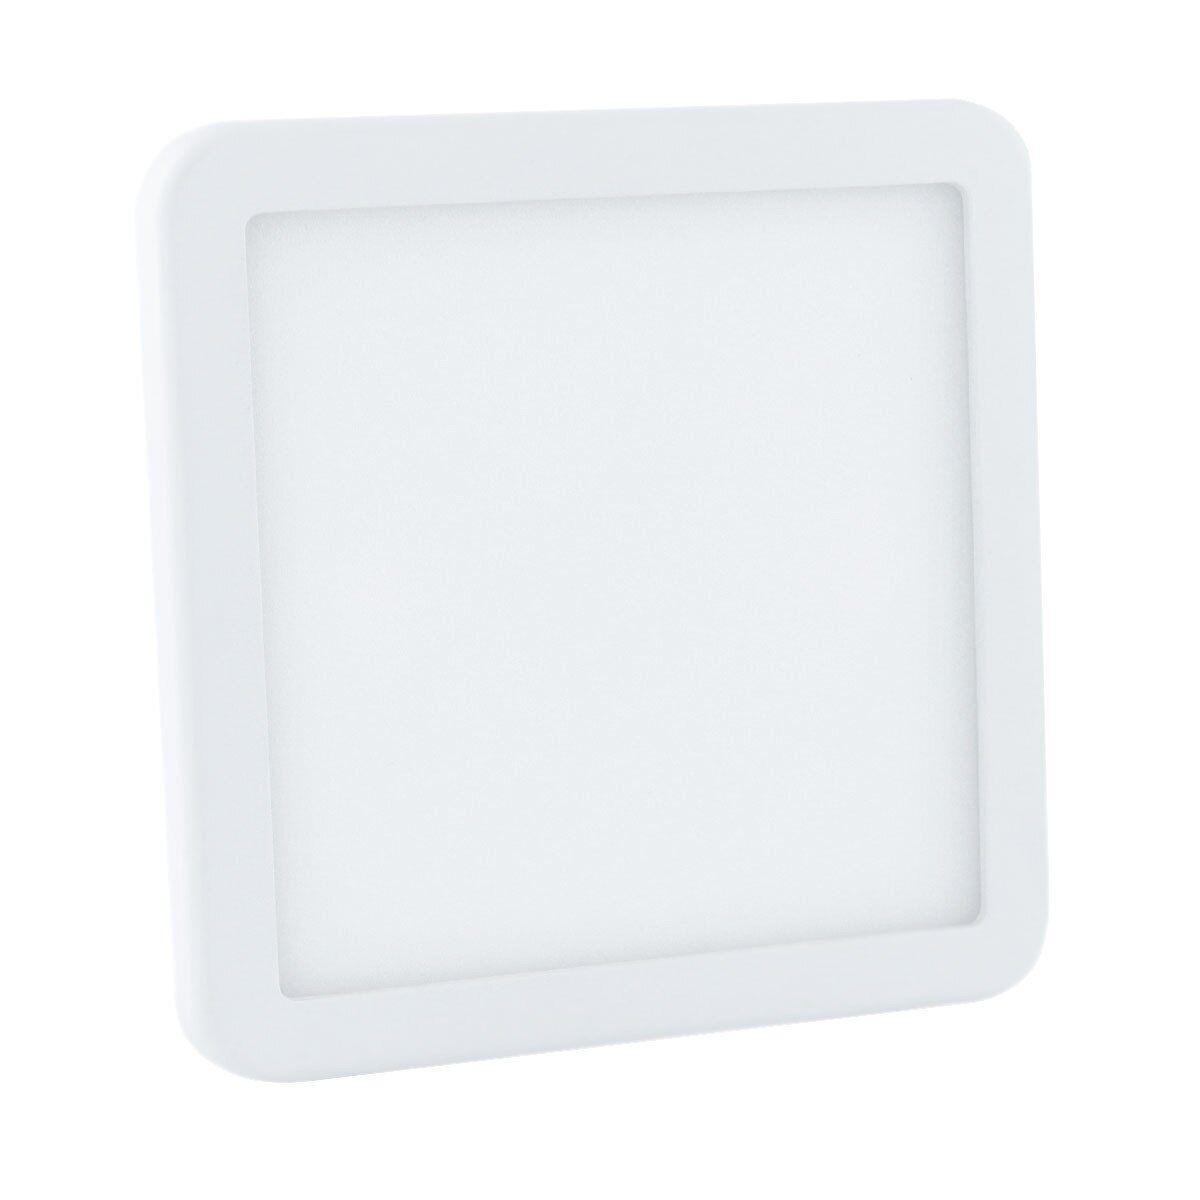 Led панель квадрат 9W (СL-S9W-5/2) 50-165mm 5000k BIOM